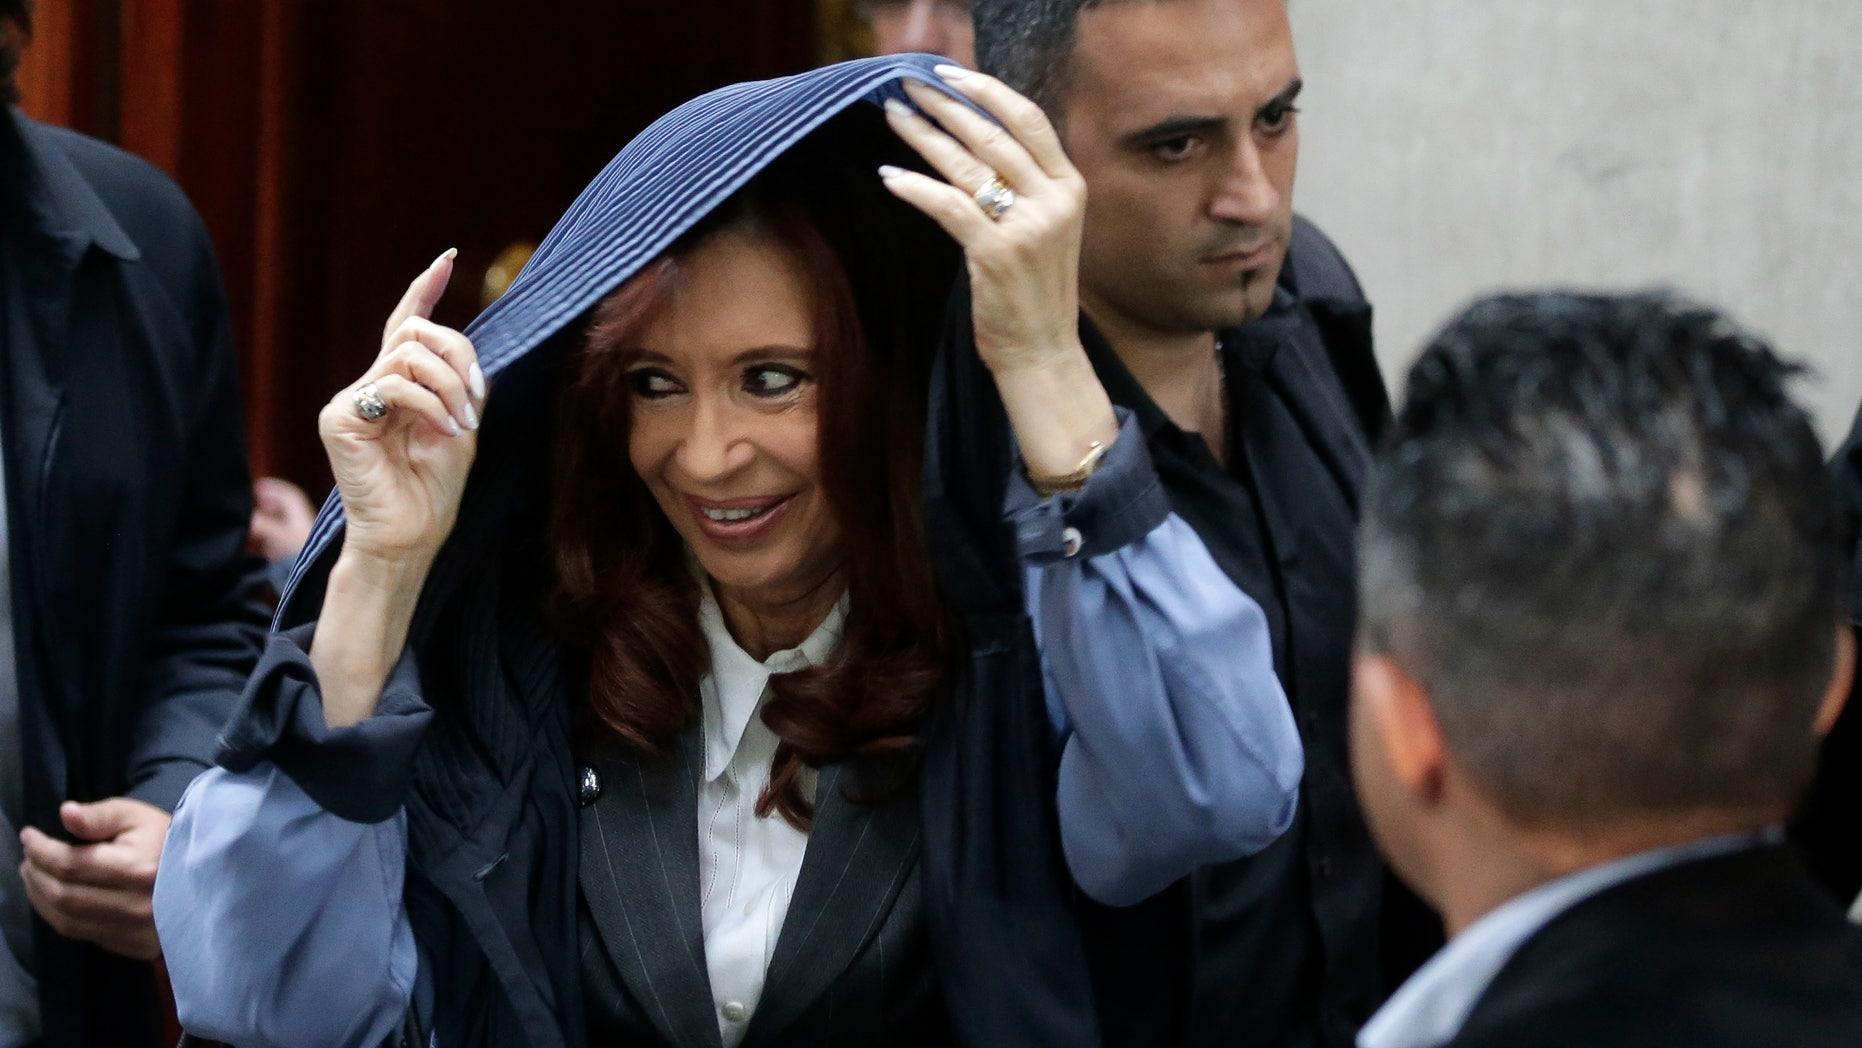 Argentina's former President Cristina Fernandez in an April 13, 2016 file photo.